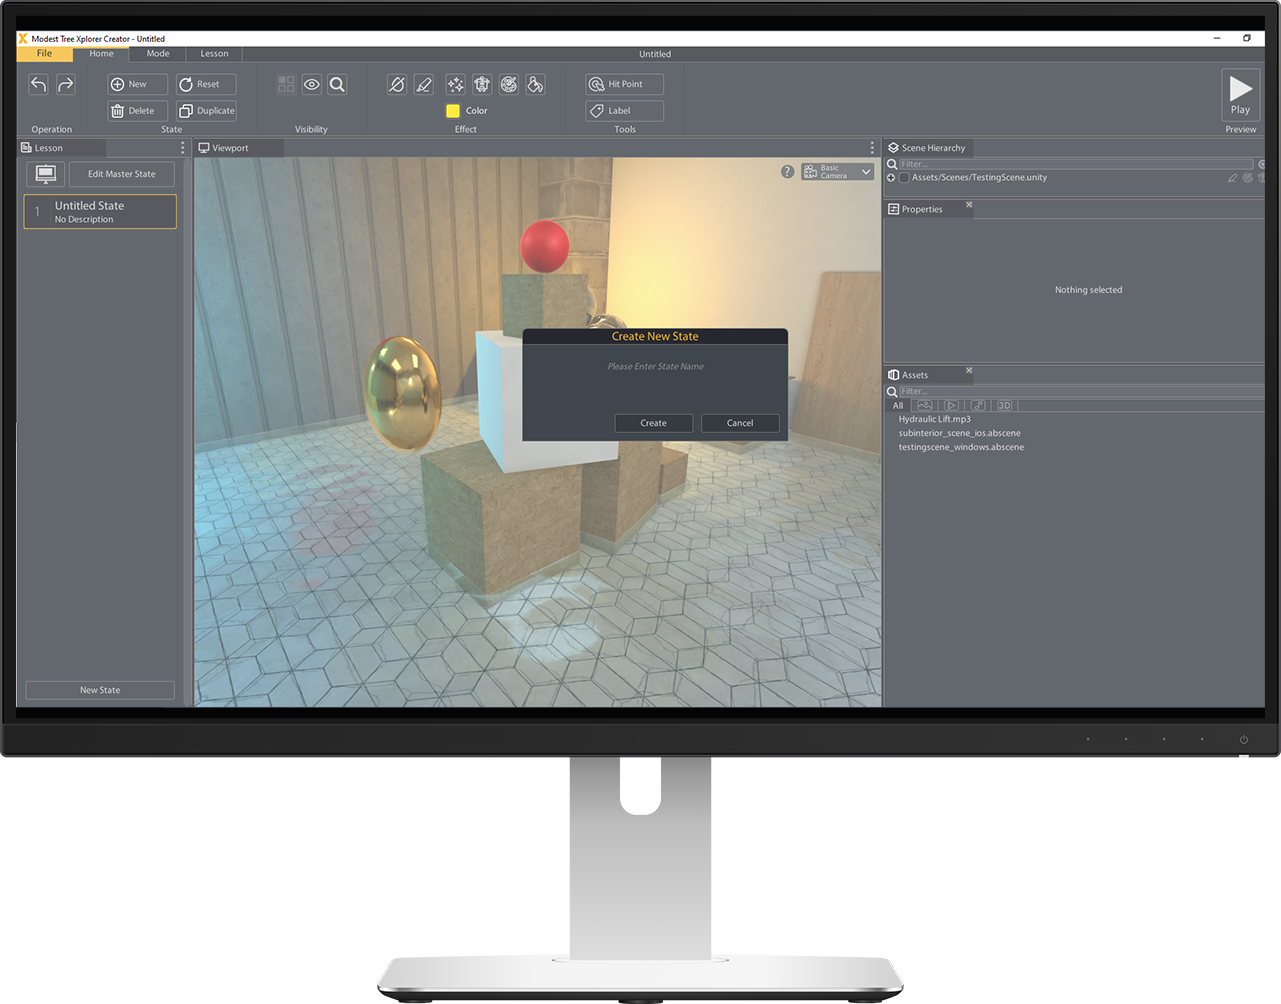 Computer Monitor showing Xplorer